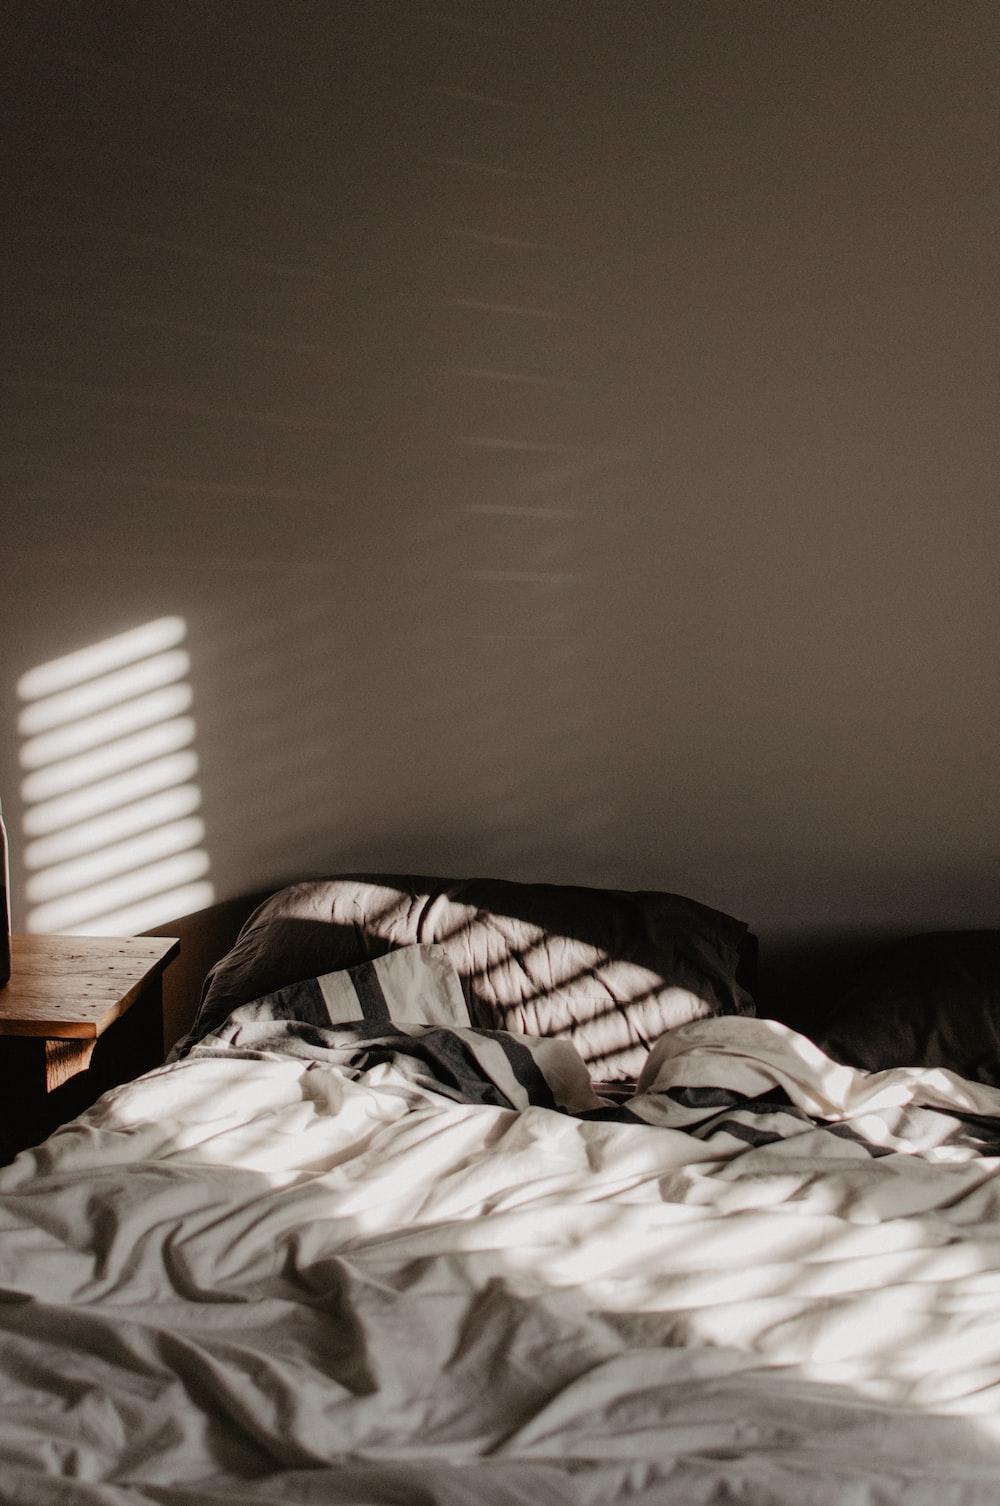 sunlight inside bed